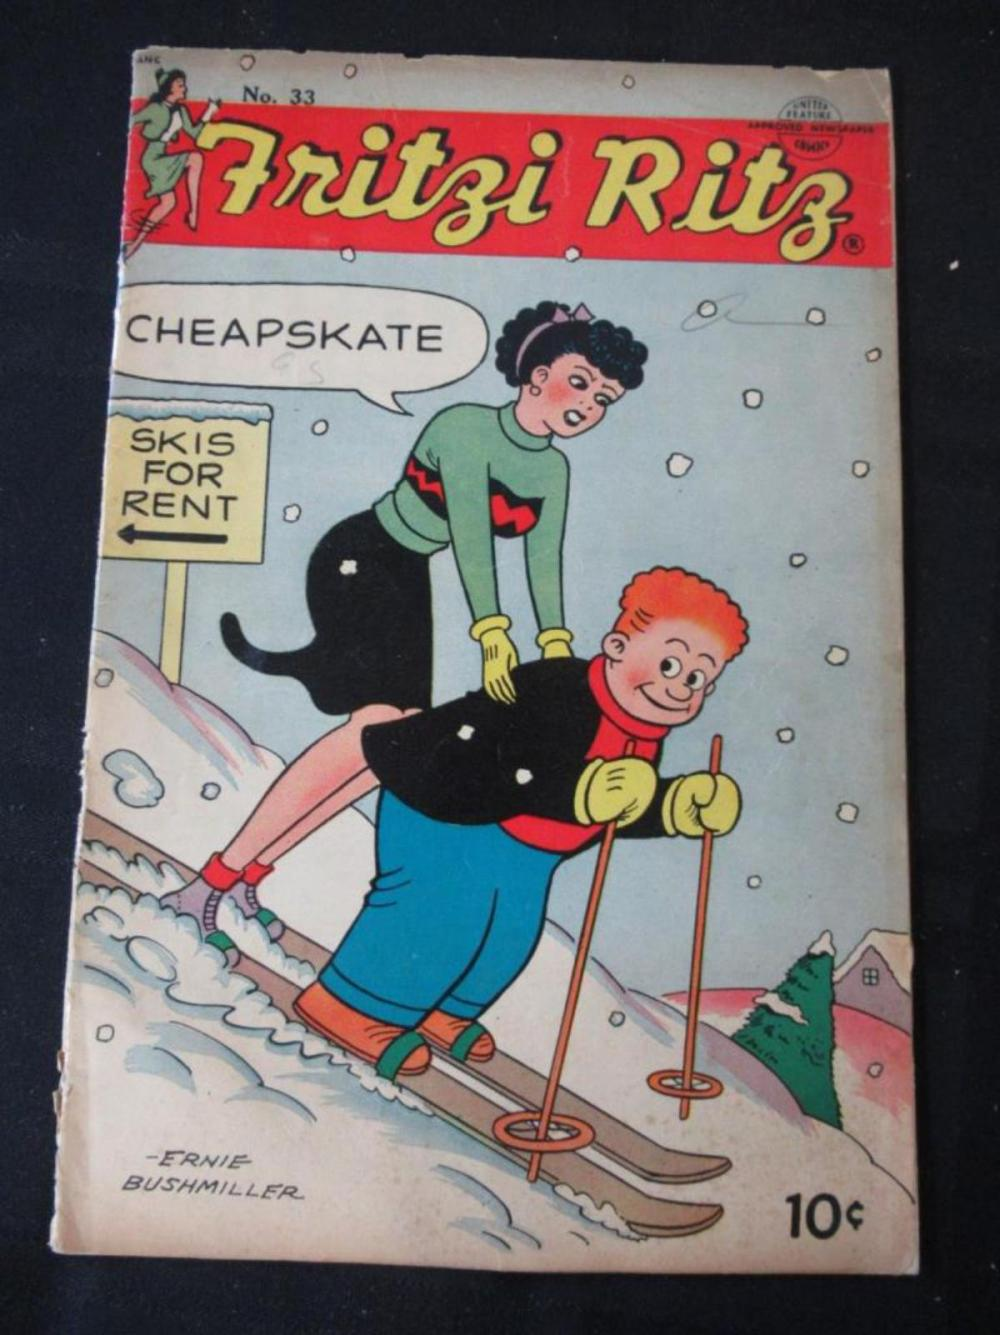 Fritzi Ritz 10c #33 Skis For Rent - Cheapskate